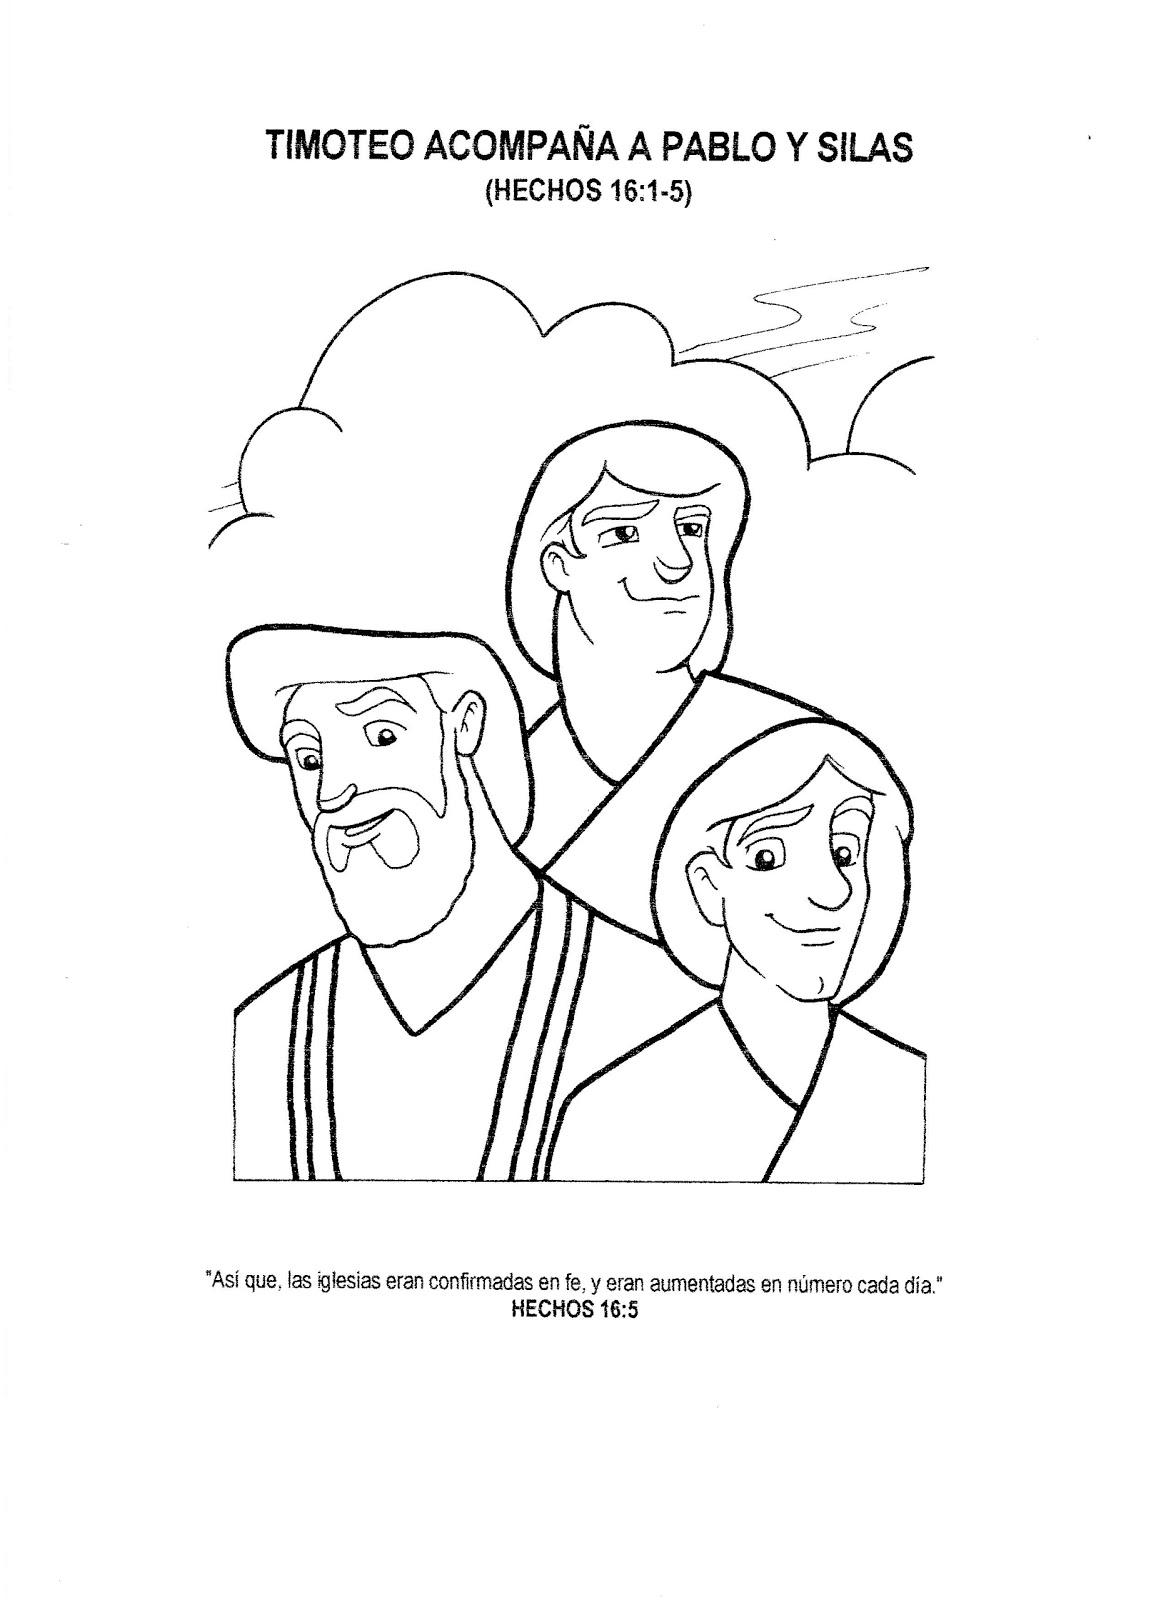 Dibujos Cristianos: Timoteo acompaña a Pablo y Silas para